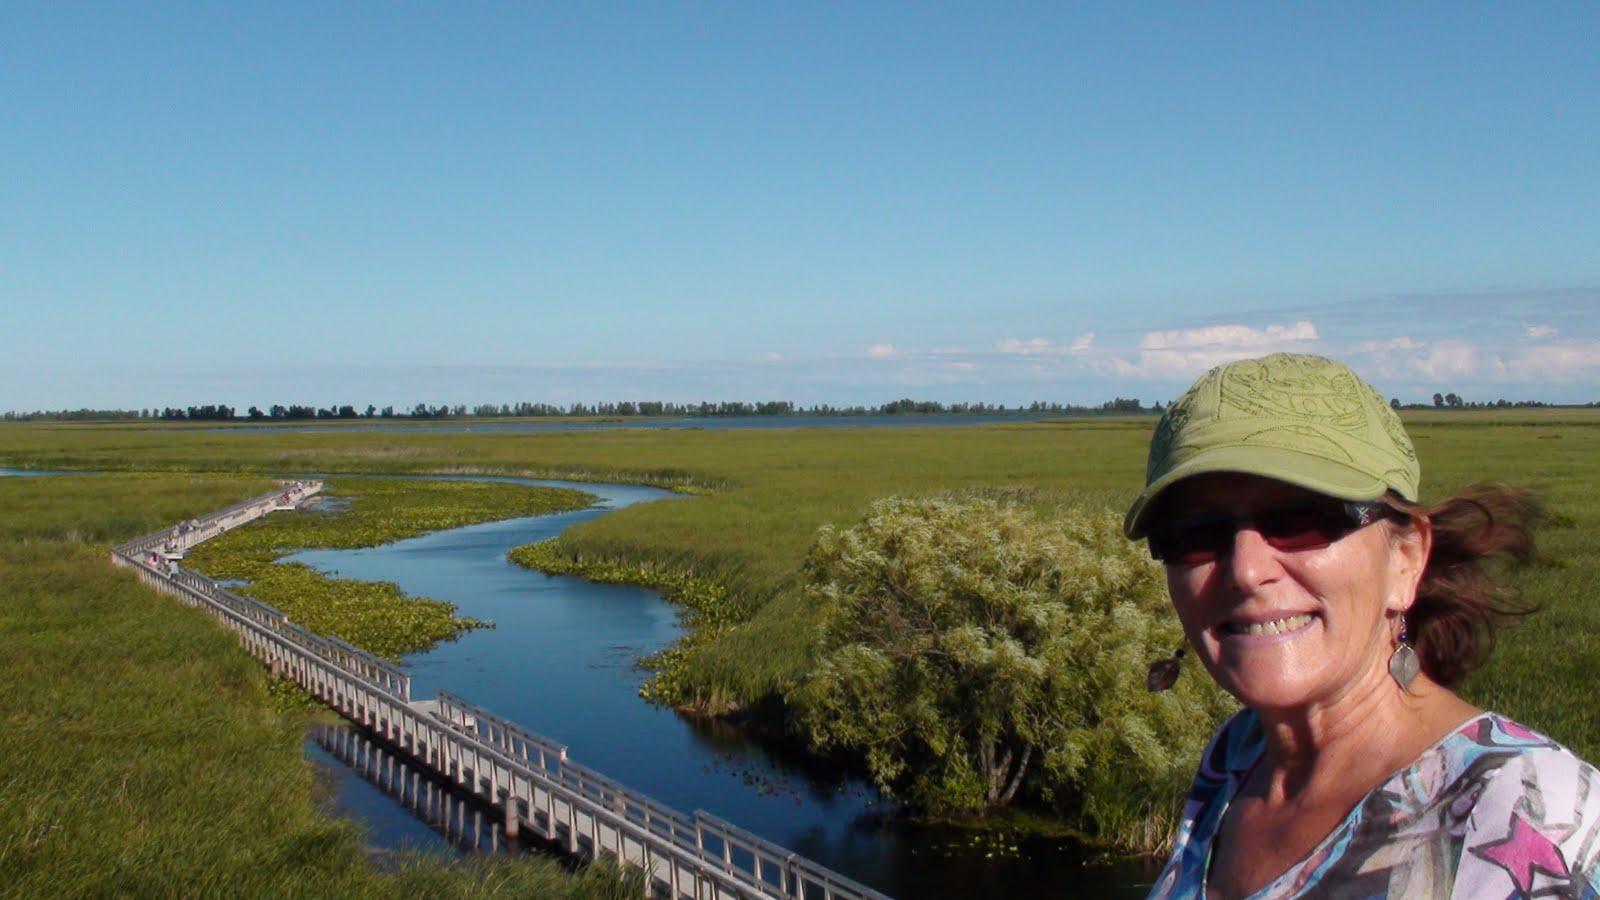 Boardwalks through the marsh.